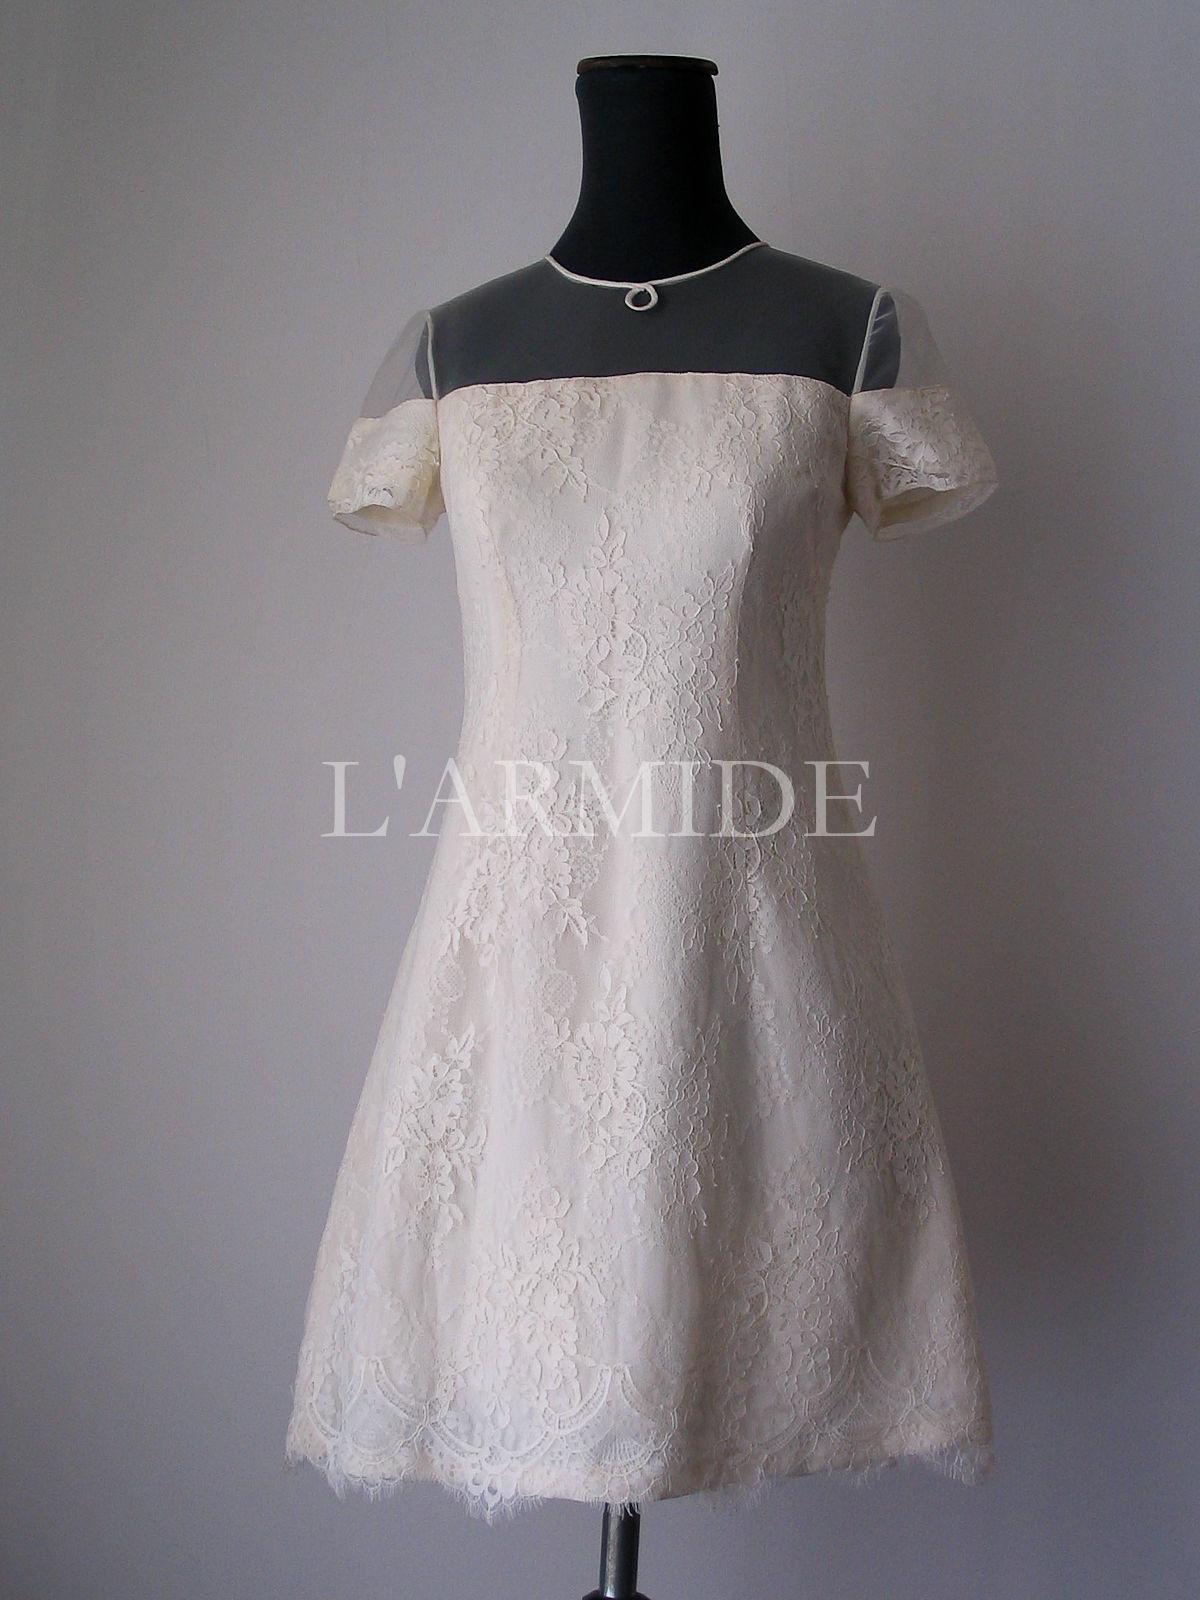 vestido-de-novia-corto-civil-buenos-aires-argentina-larmide-IMG_5171.jpg